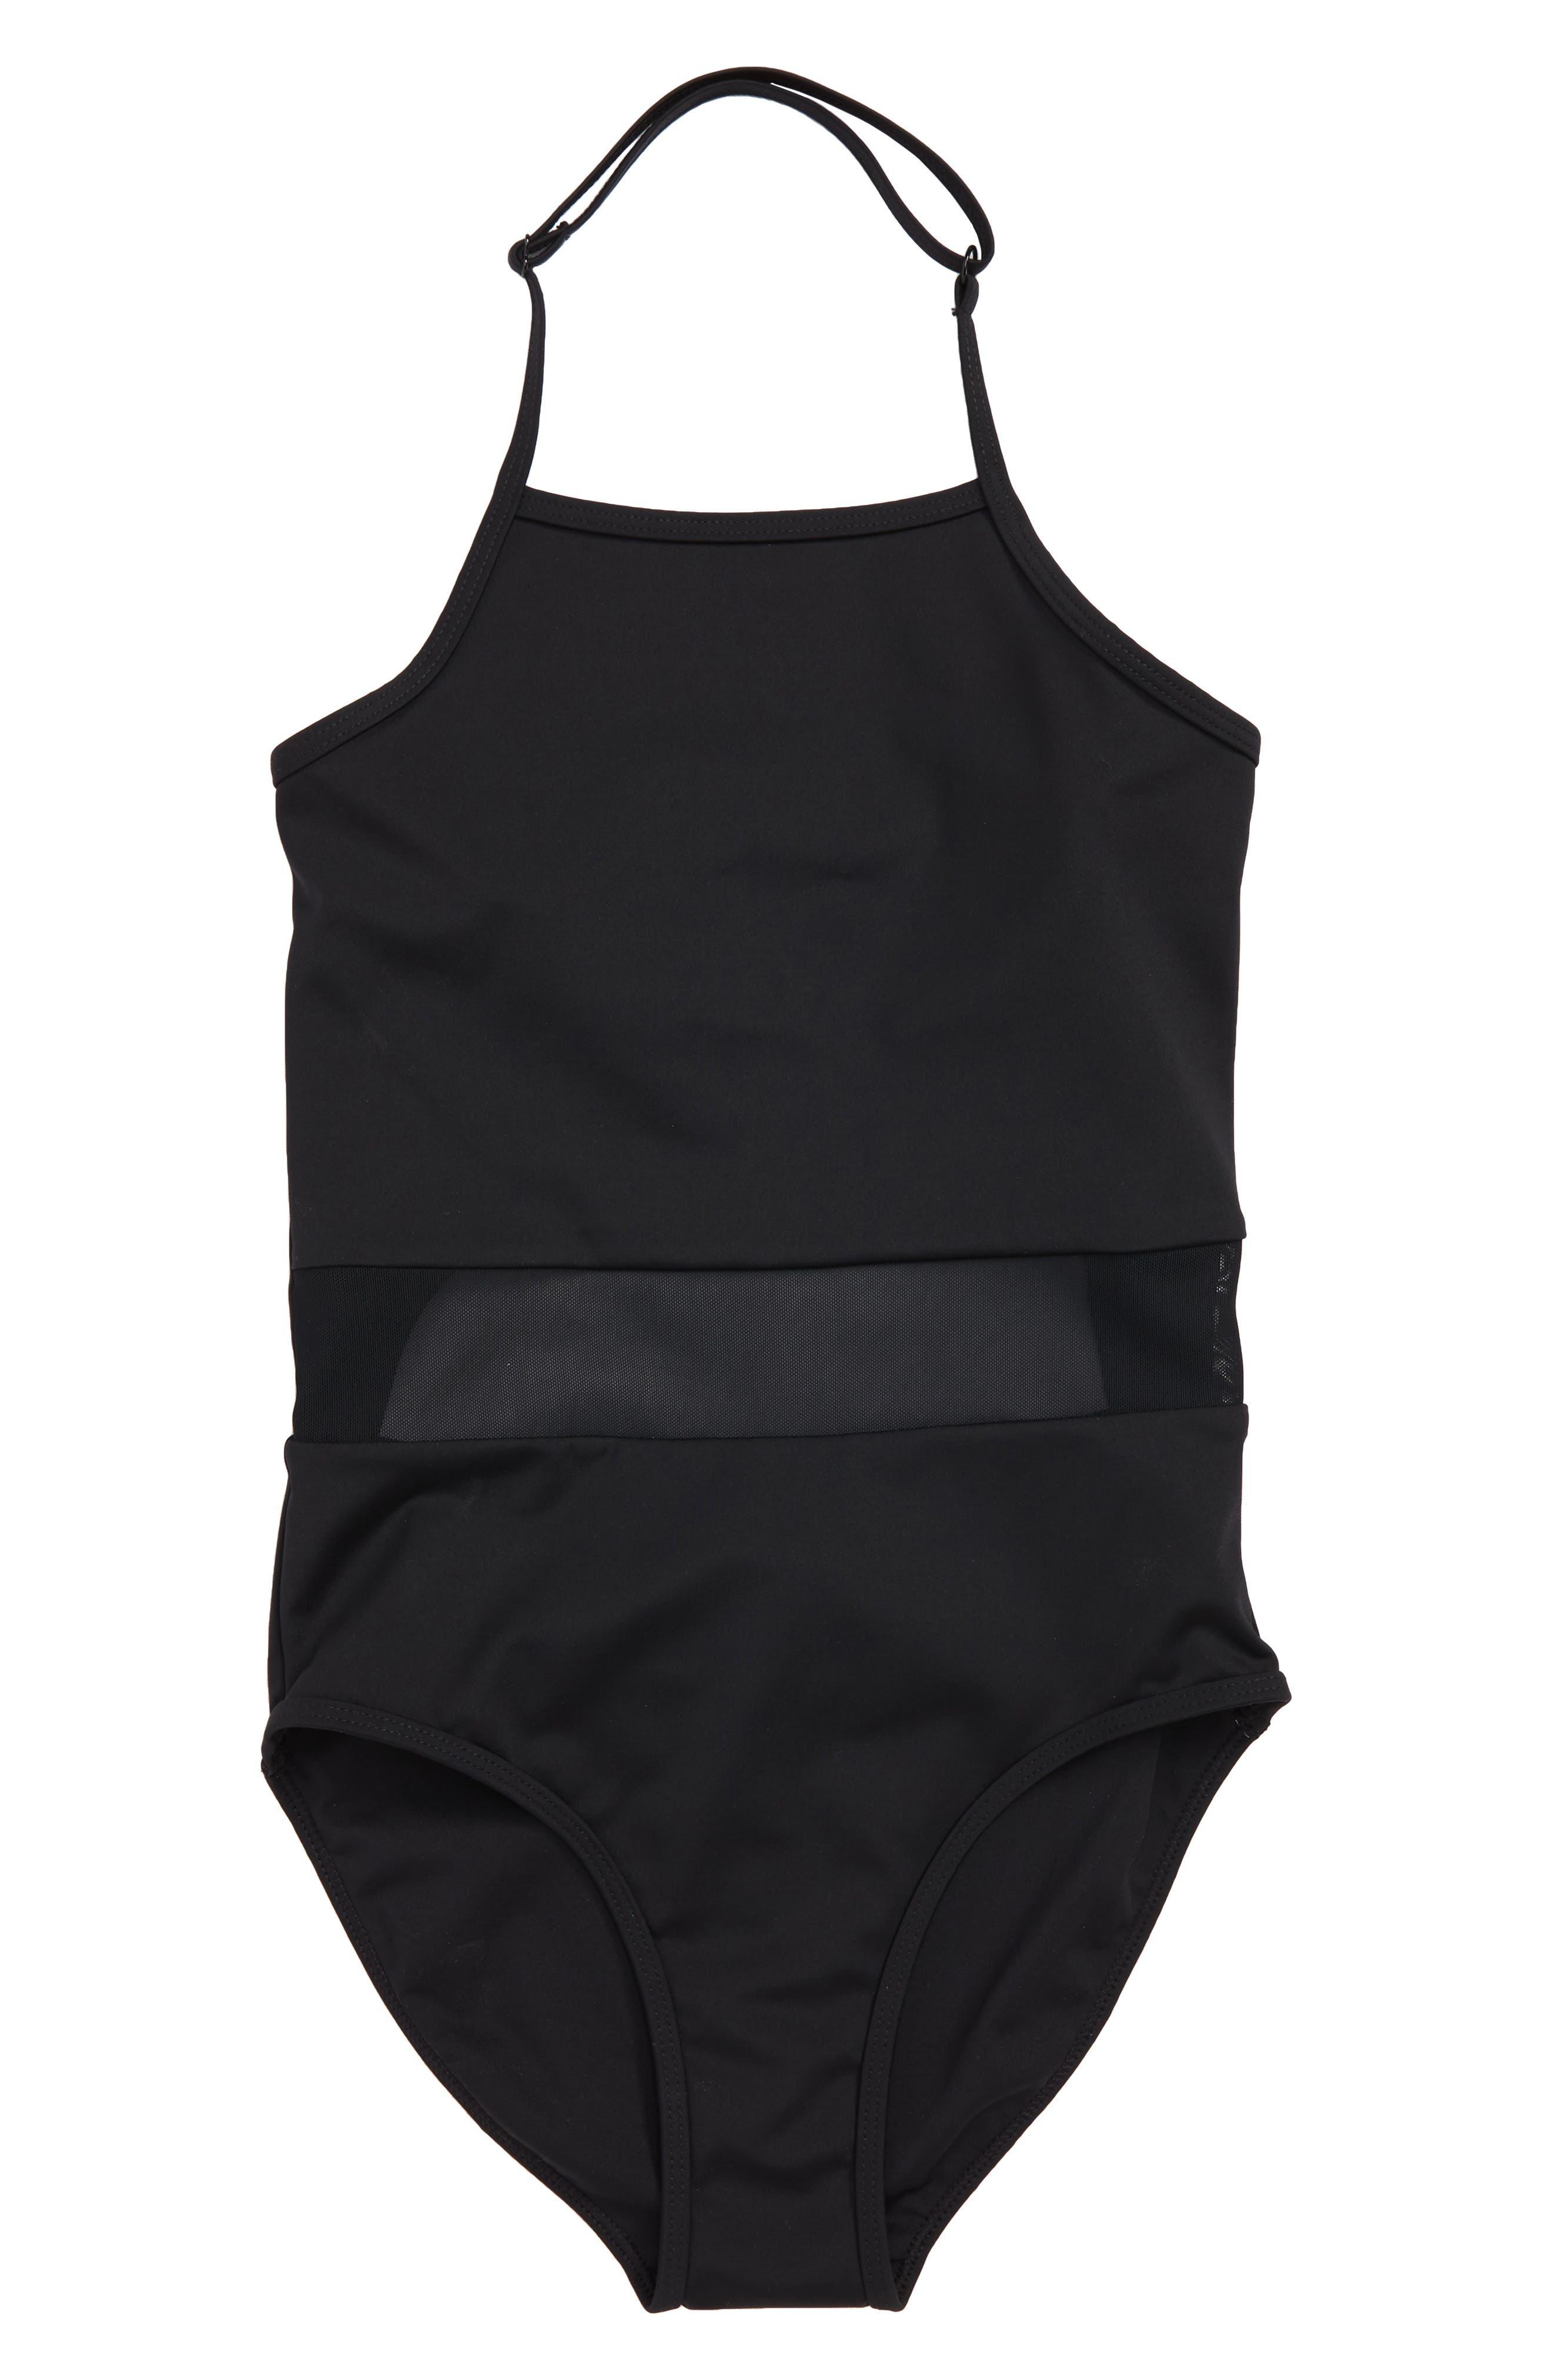 Horizon Mesh Inset One-Piece Swimsuit,                         Main,                         color, Black